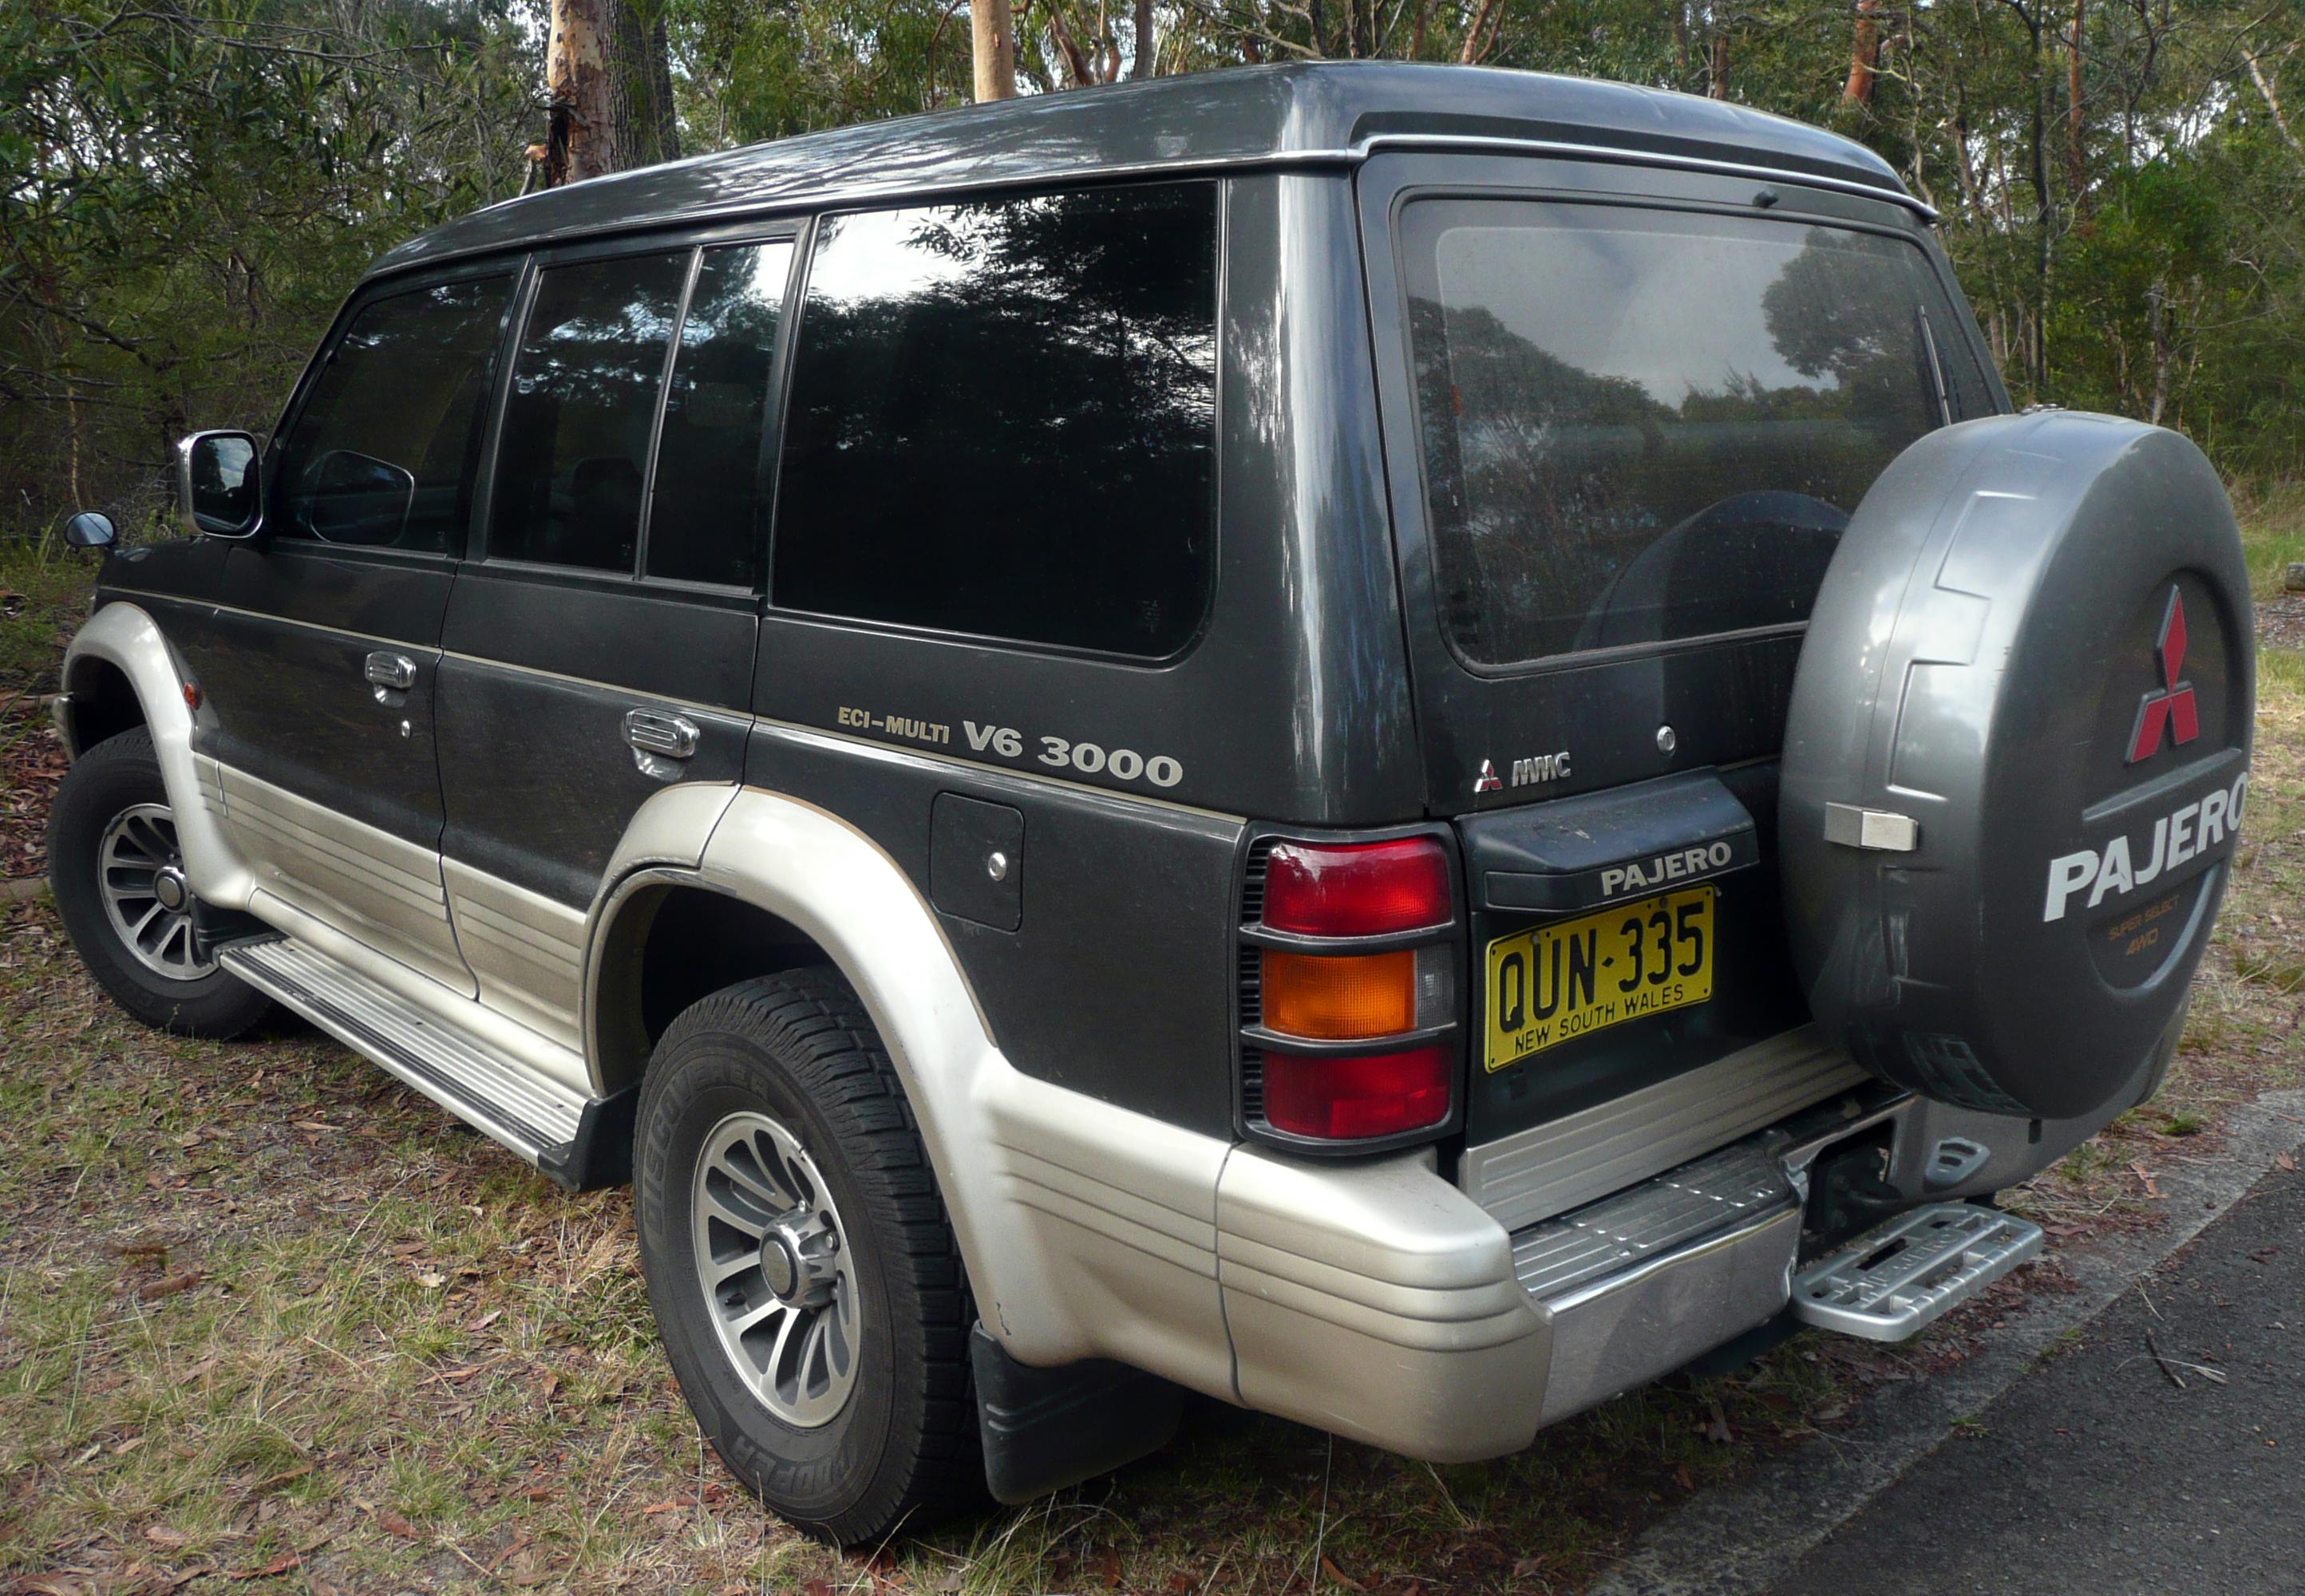 File 1991 1993 Mitsubishi Pajero Nh V6 3000 Wagon 03 Jpg